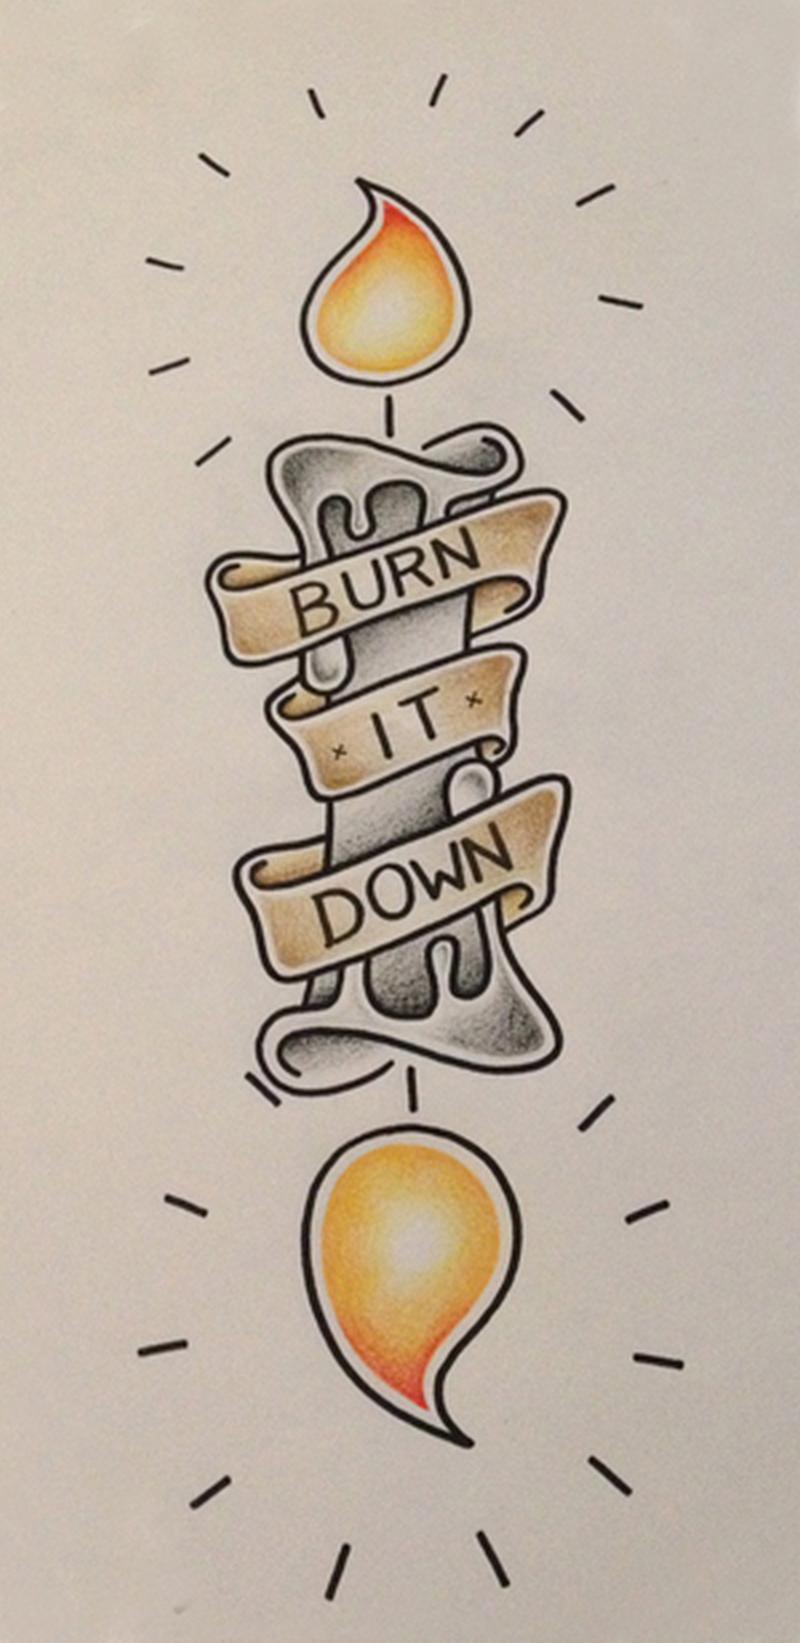 Burn it down candle tattoo design